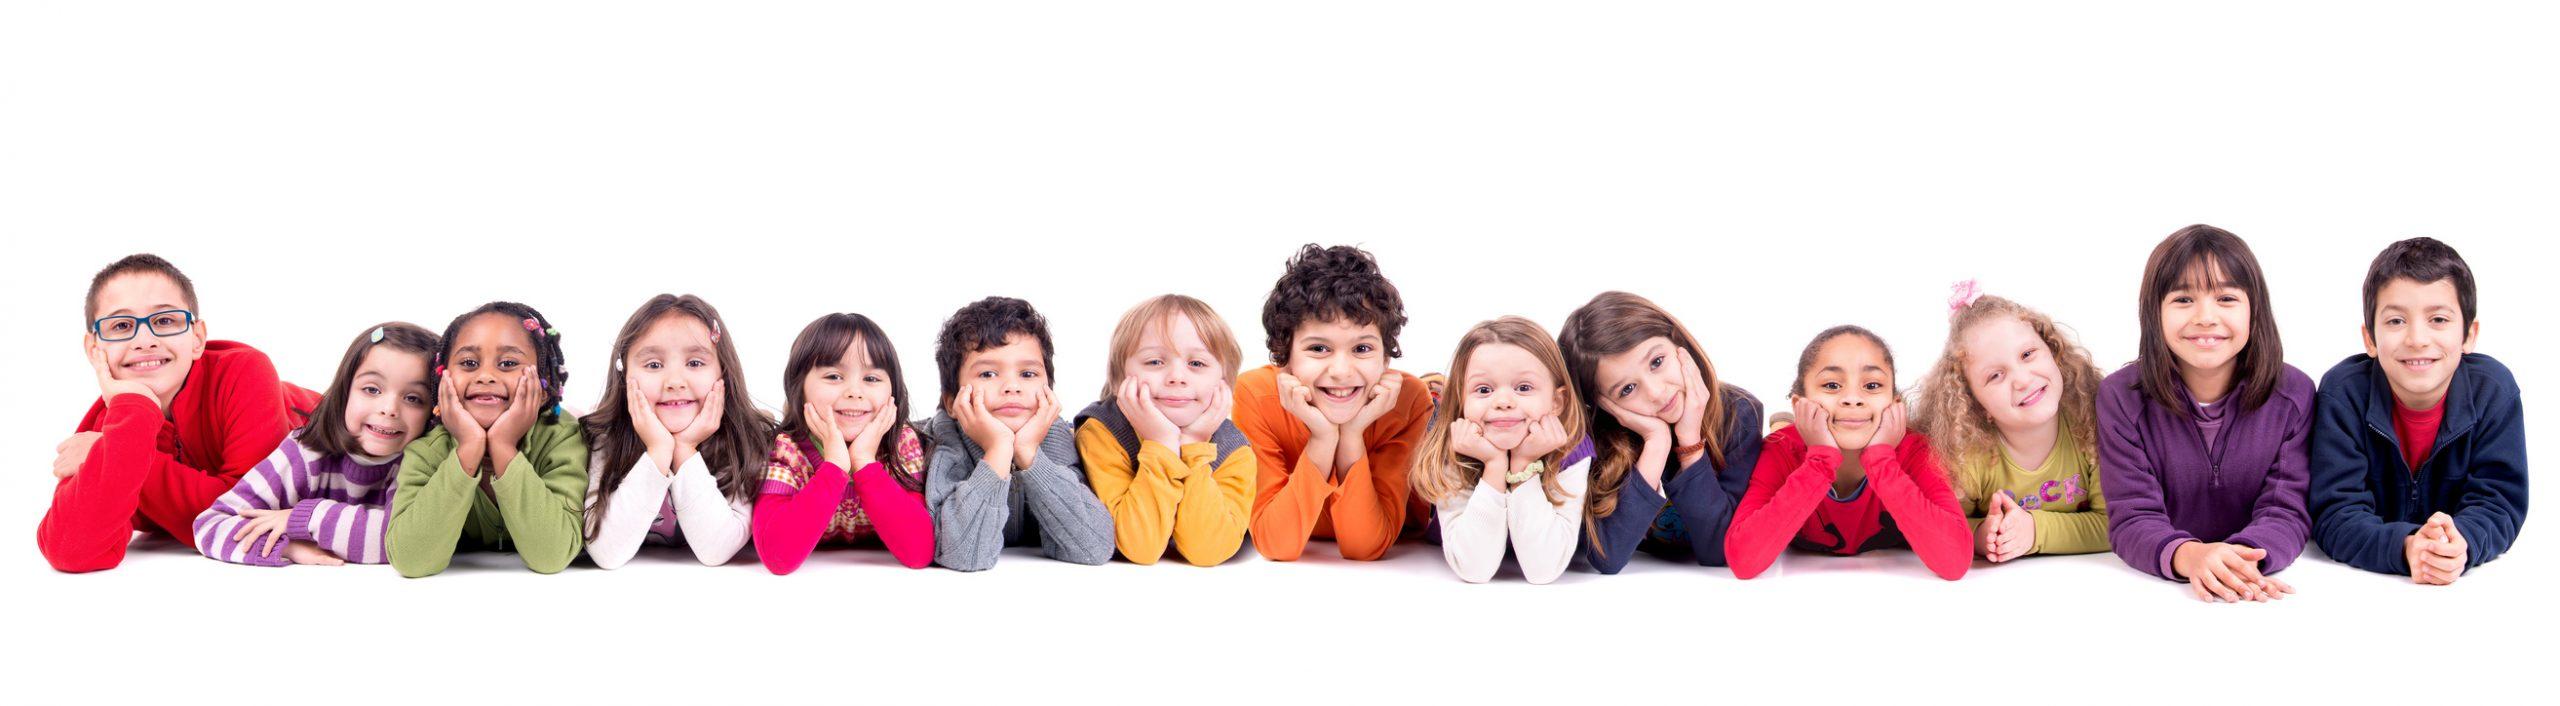 Helping kids back to school